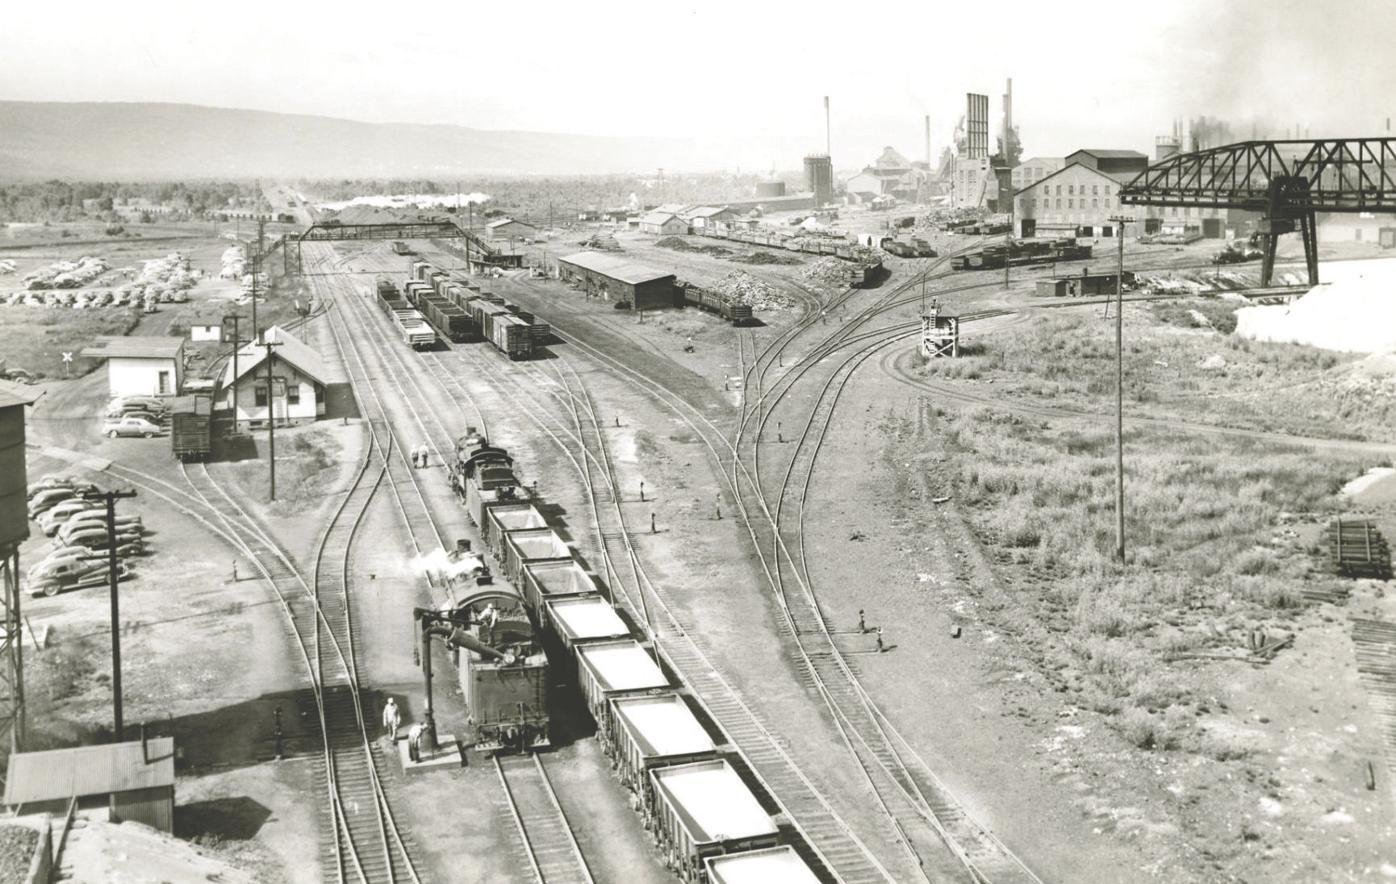 duluth works steelton yard 1950.jpg